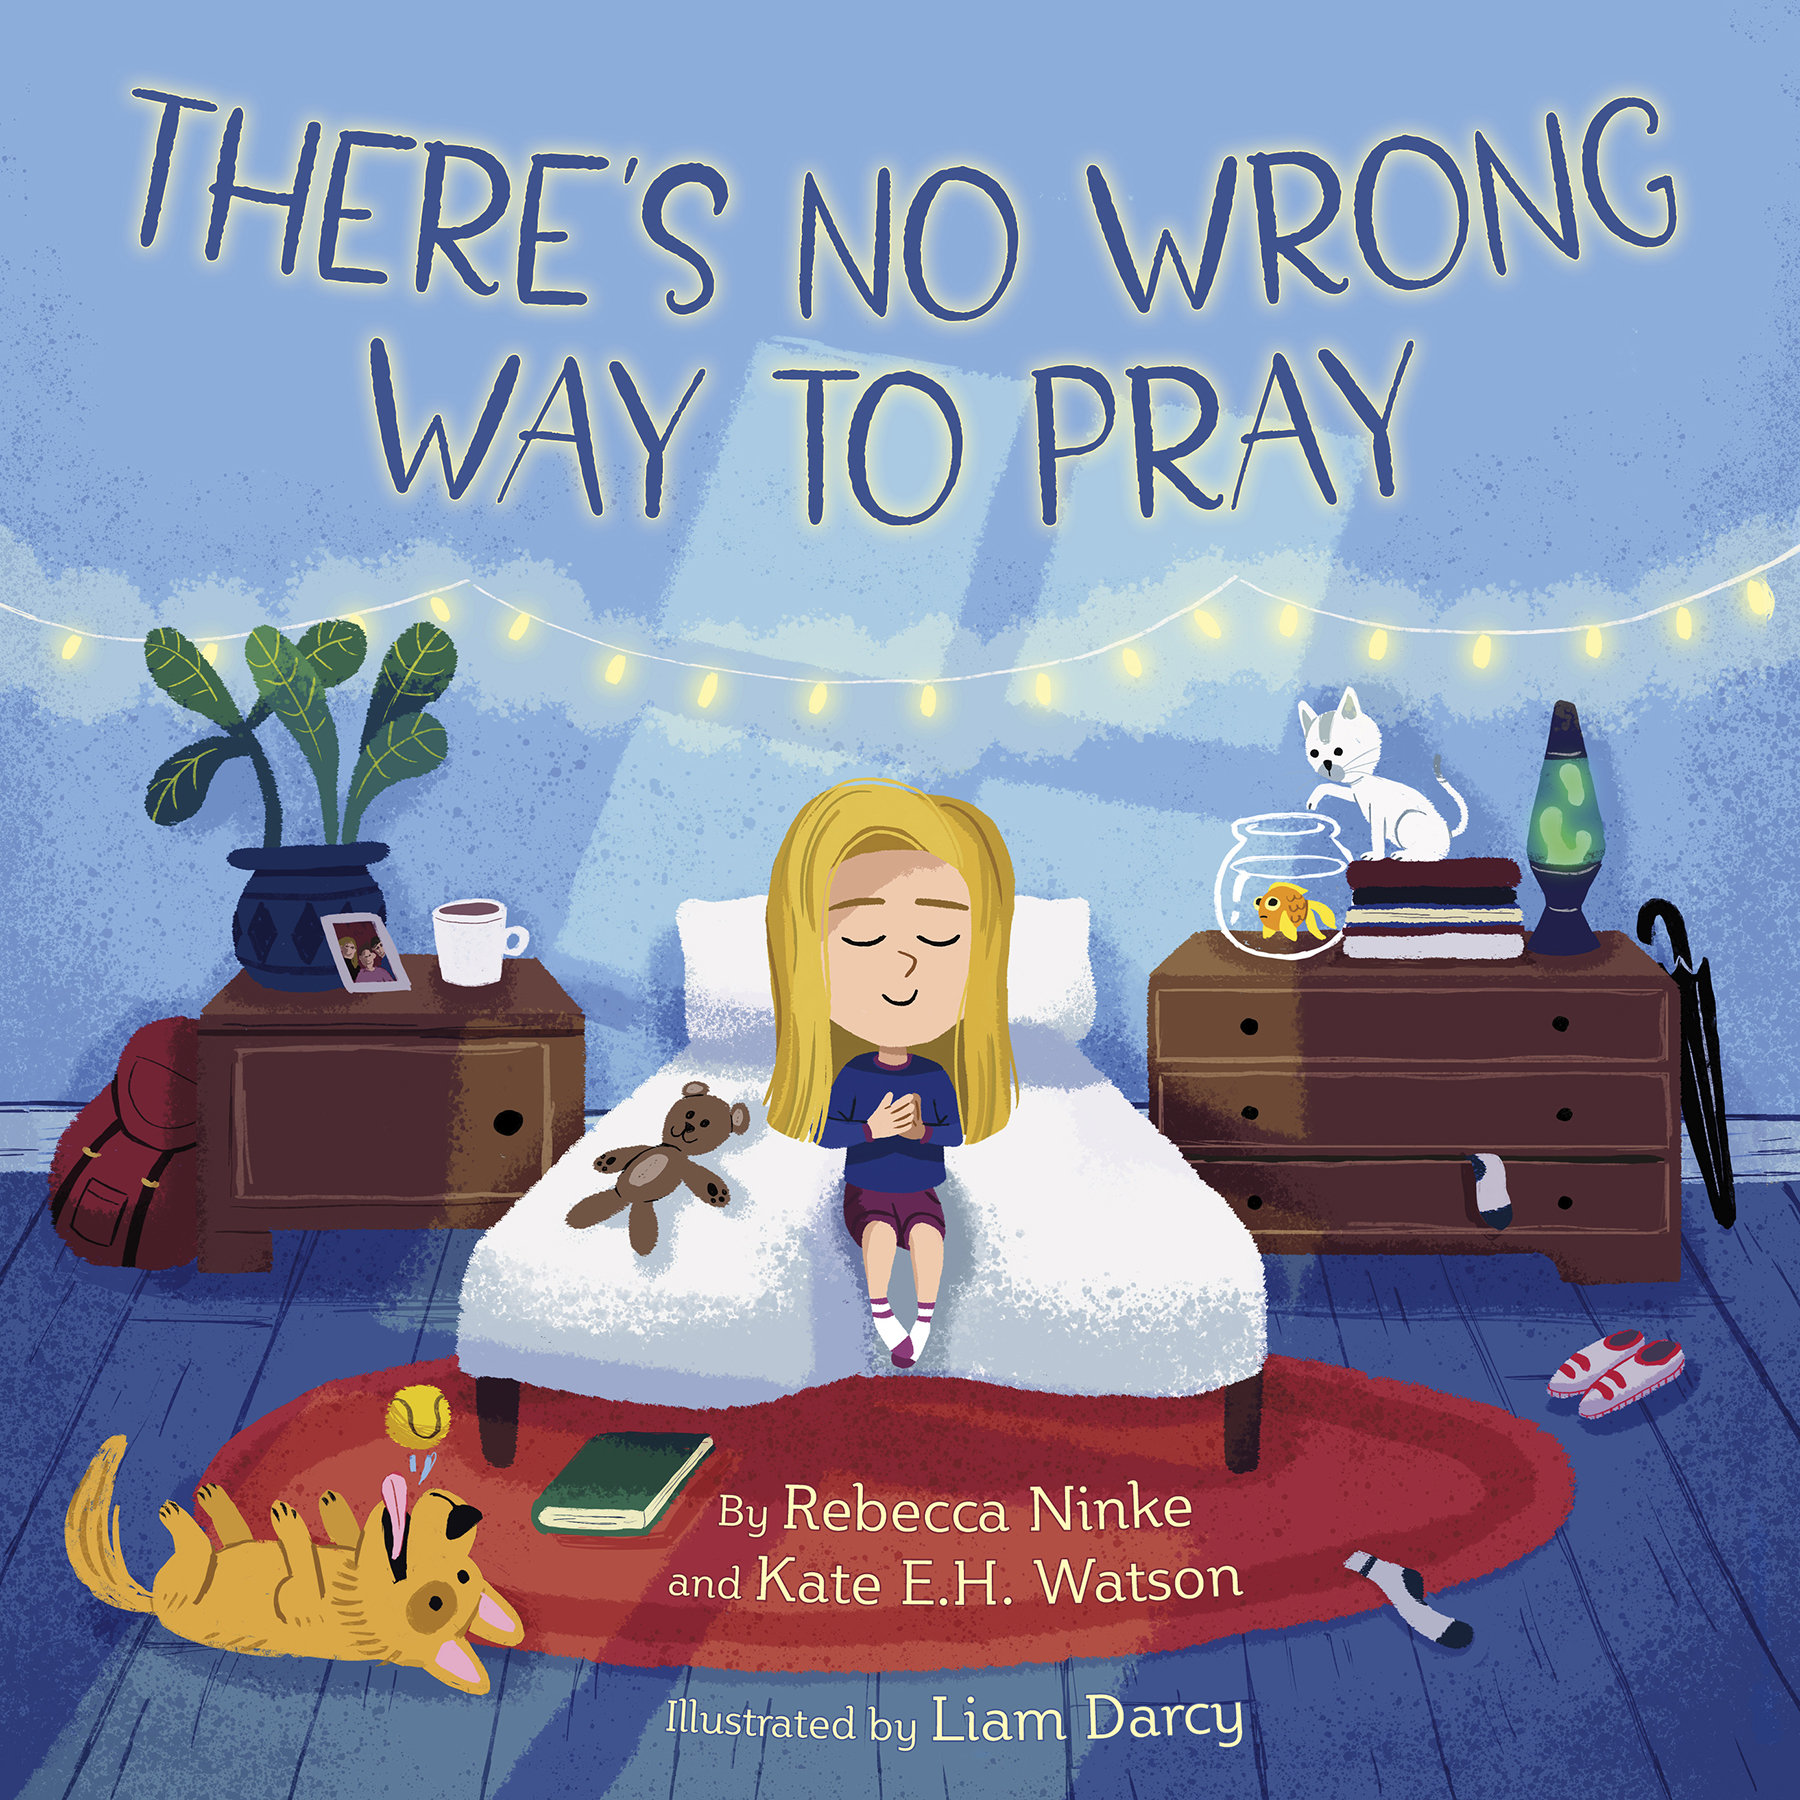 There's No Wrong Way to Pray